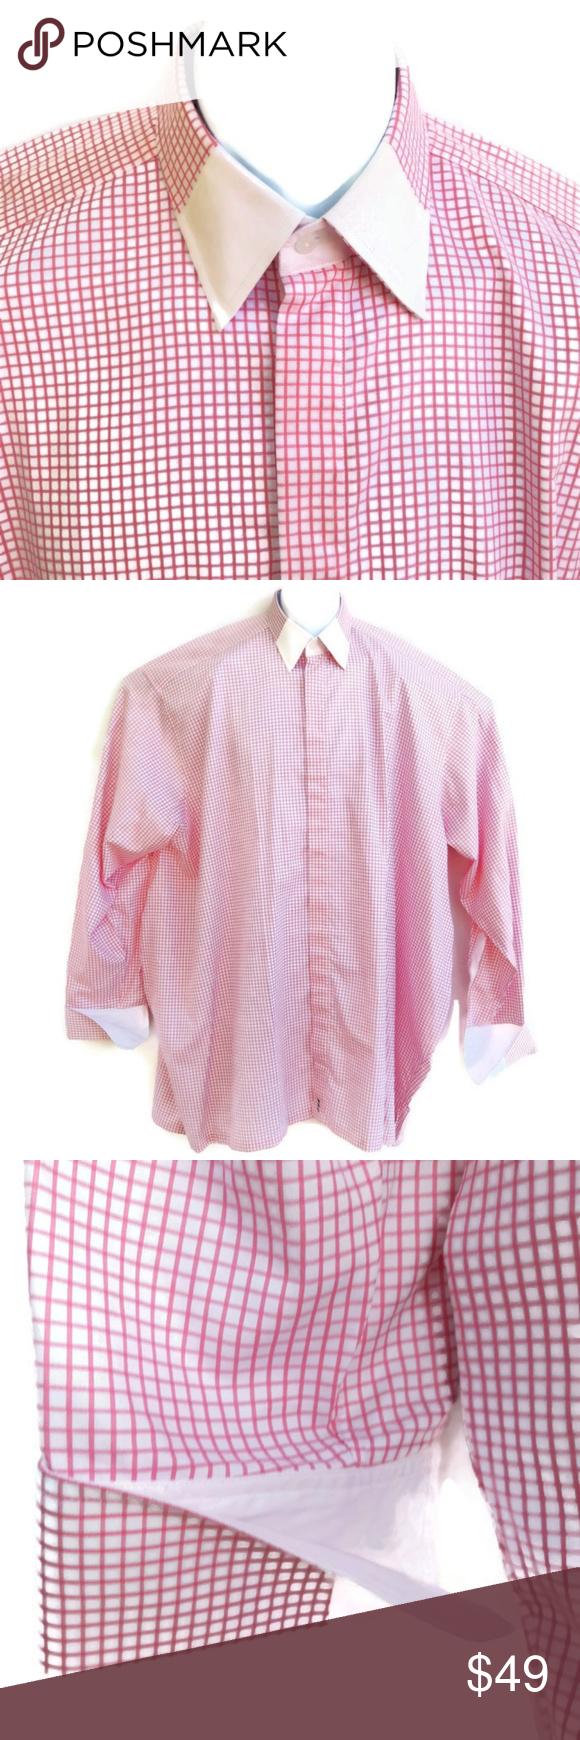 Tailor Made Shirt 5x Dress Button Down French Cuff My Posh Picks